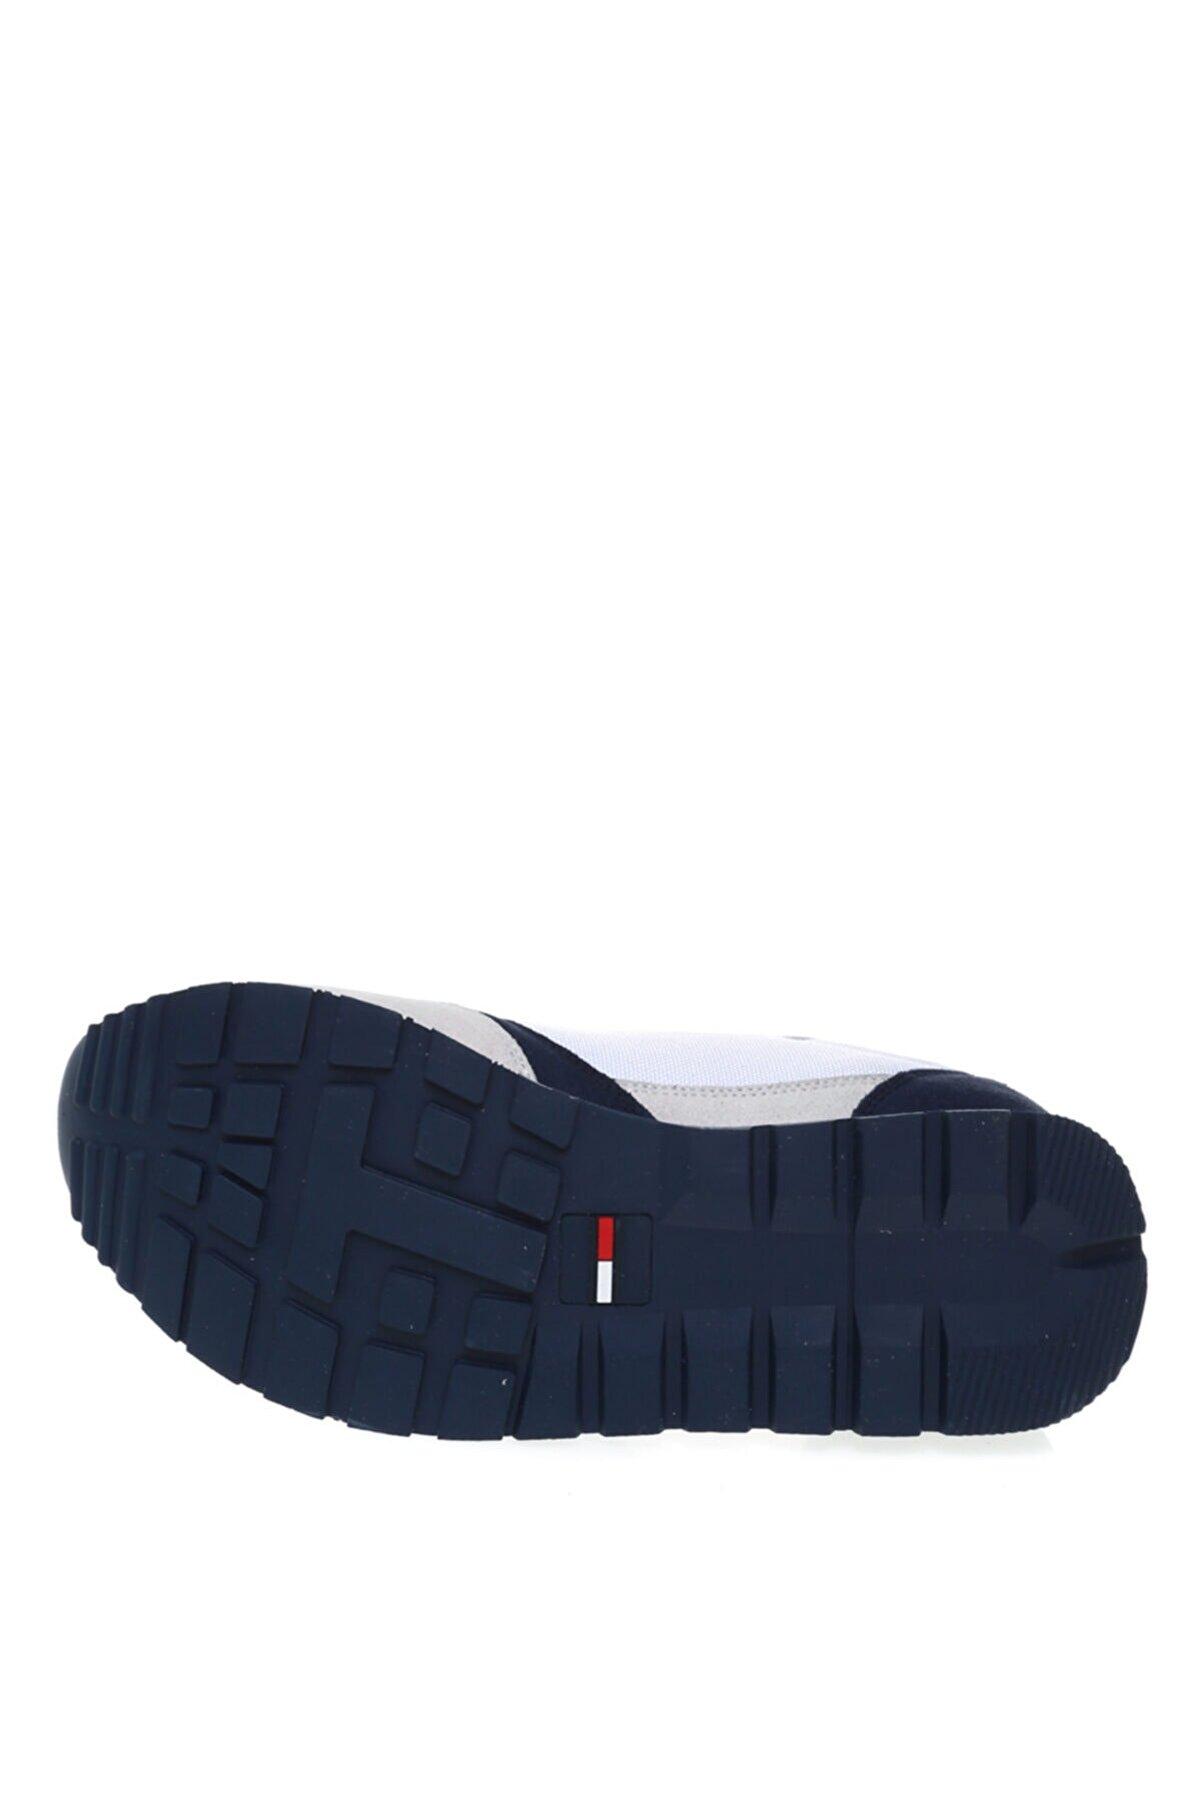 Tommy Hilfiger Sneaker, 41, Beyaz